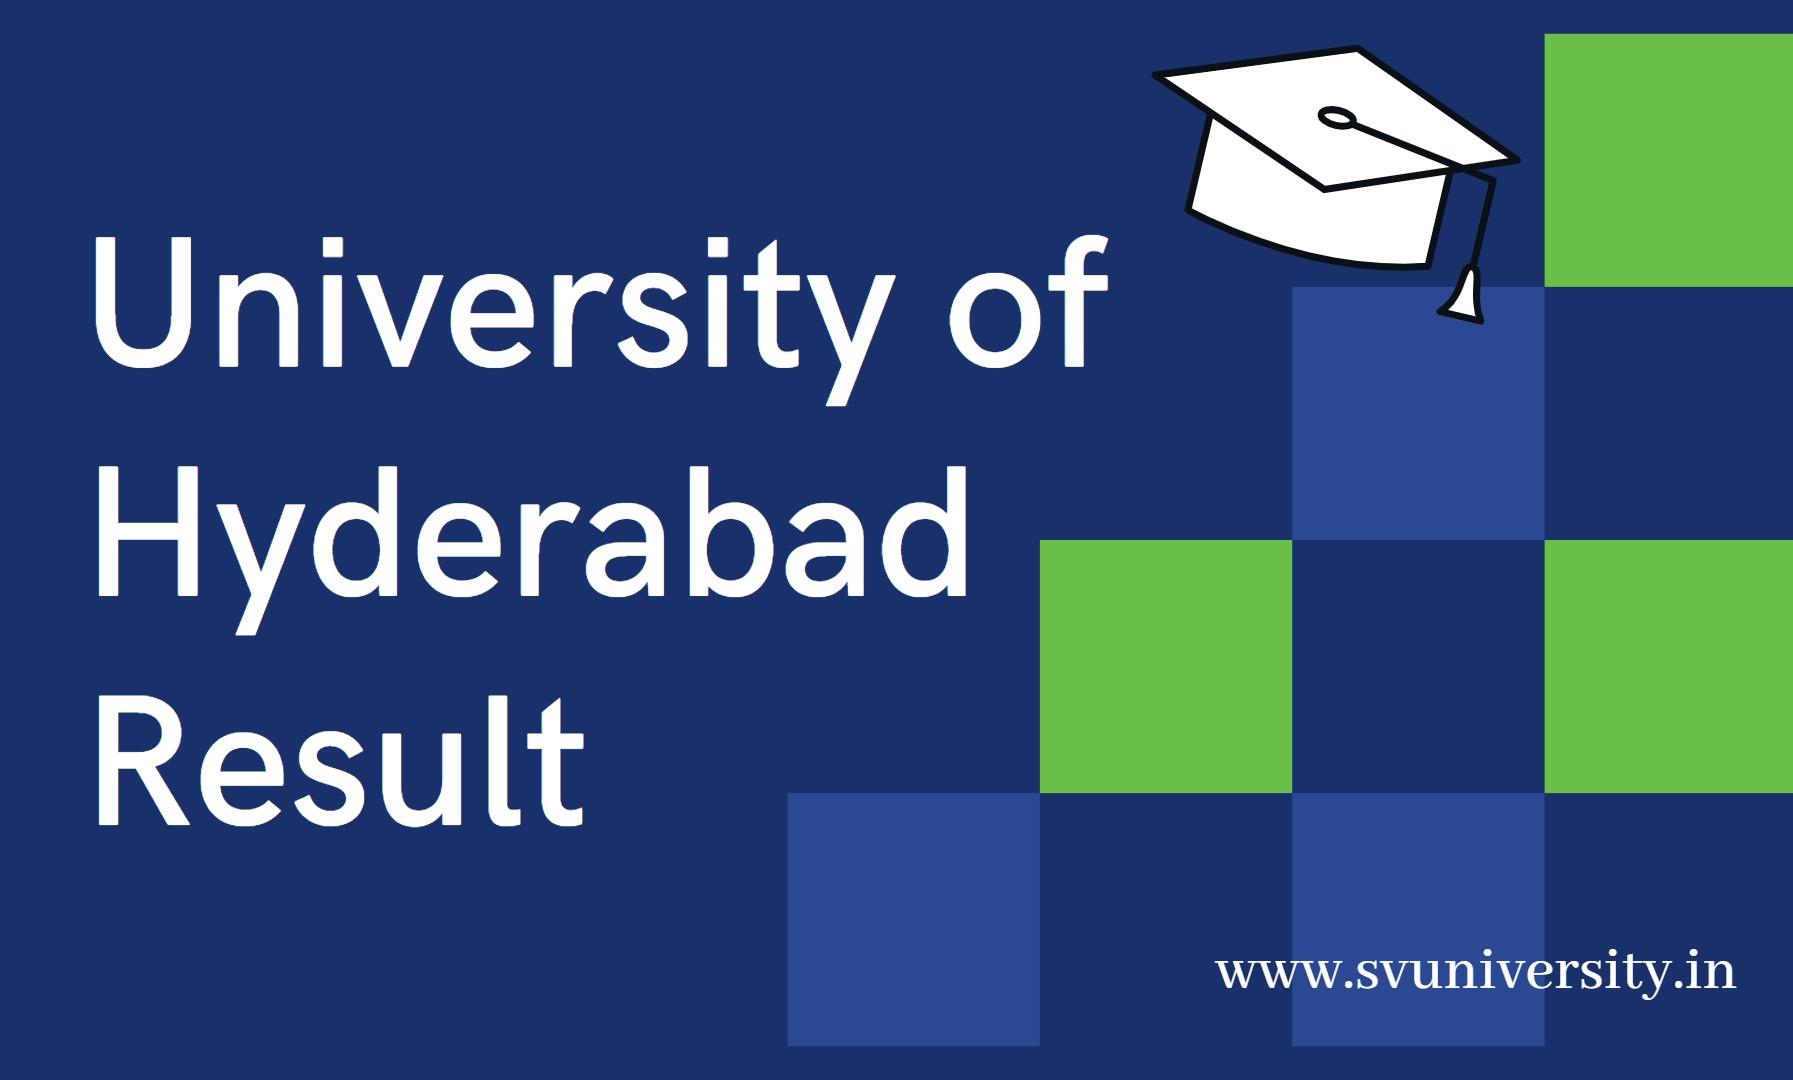 University-of-Hyderabad-result